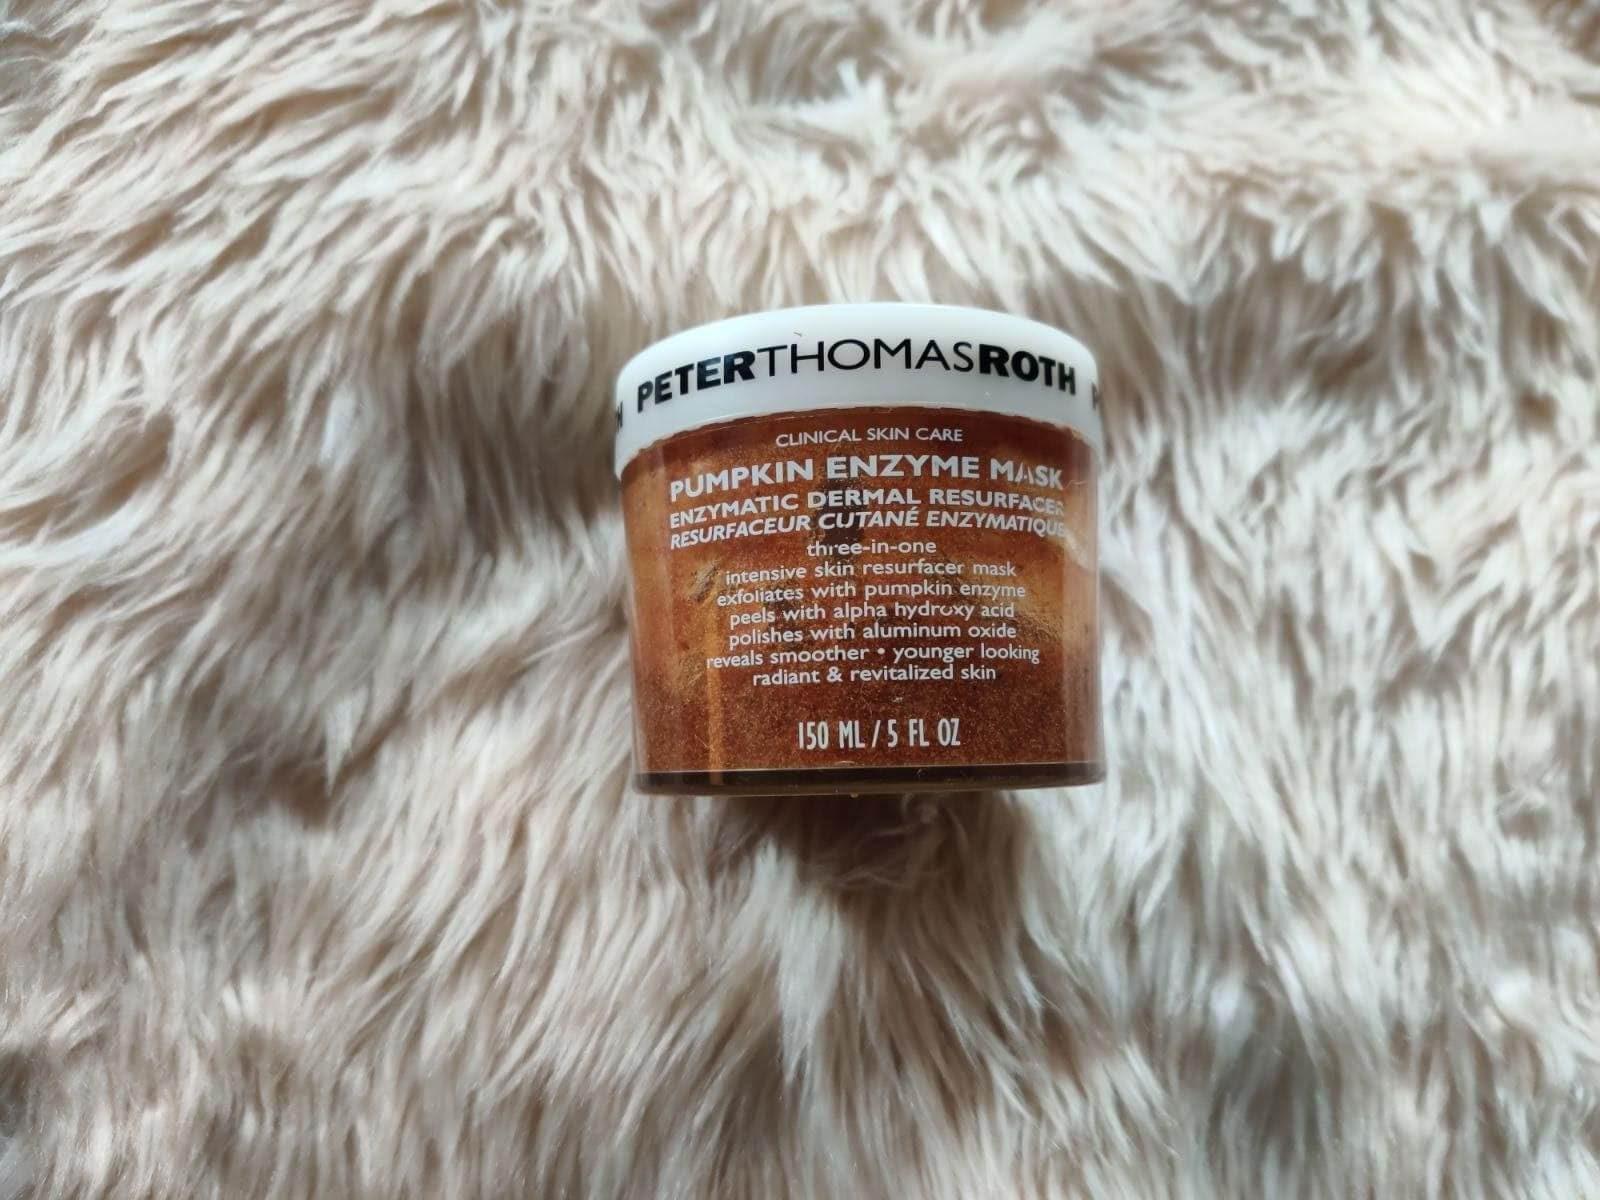 Peter Thomas Roth Pumpkin Enzyme Mask Enzymatic Dermal Resurfacer usage